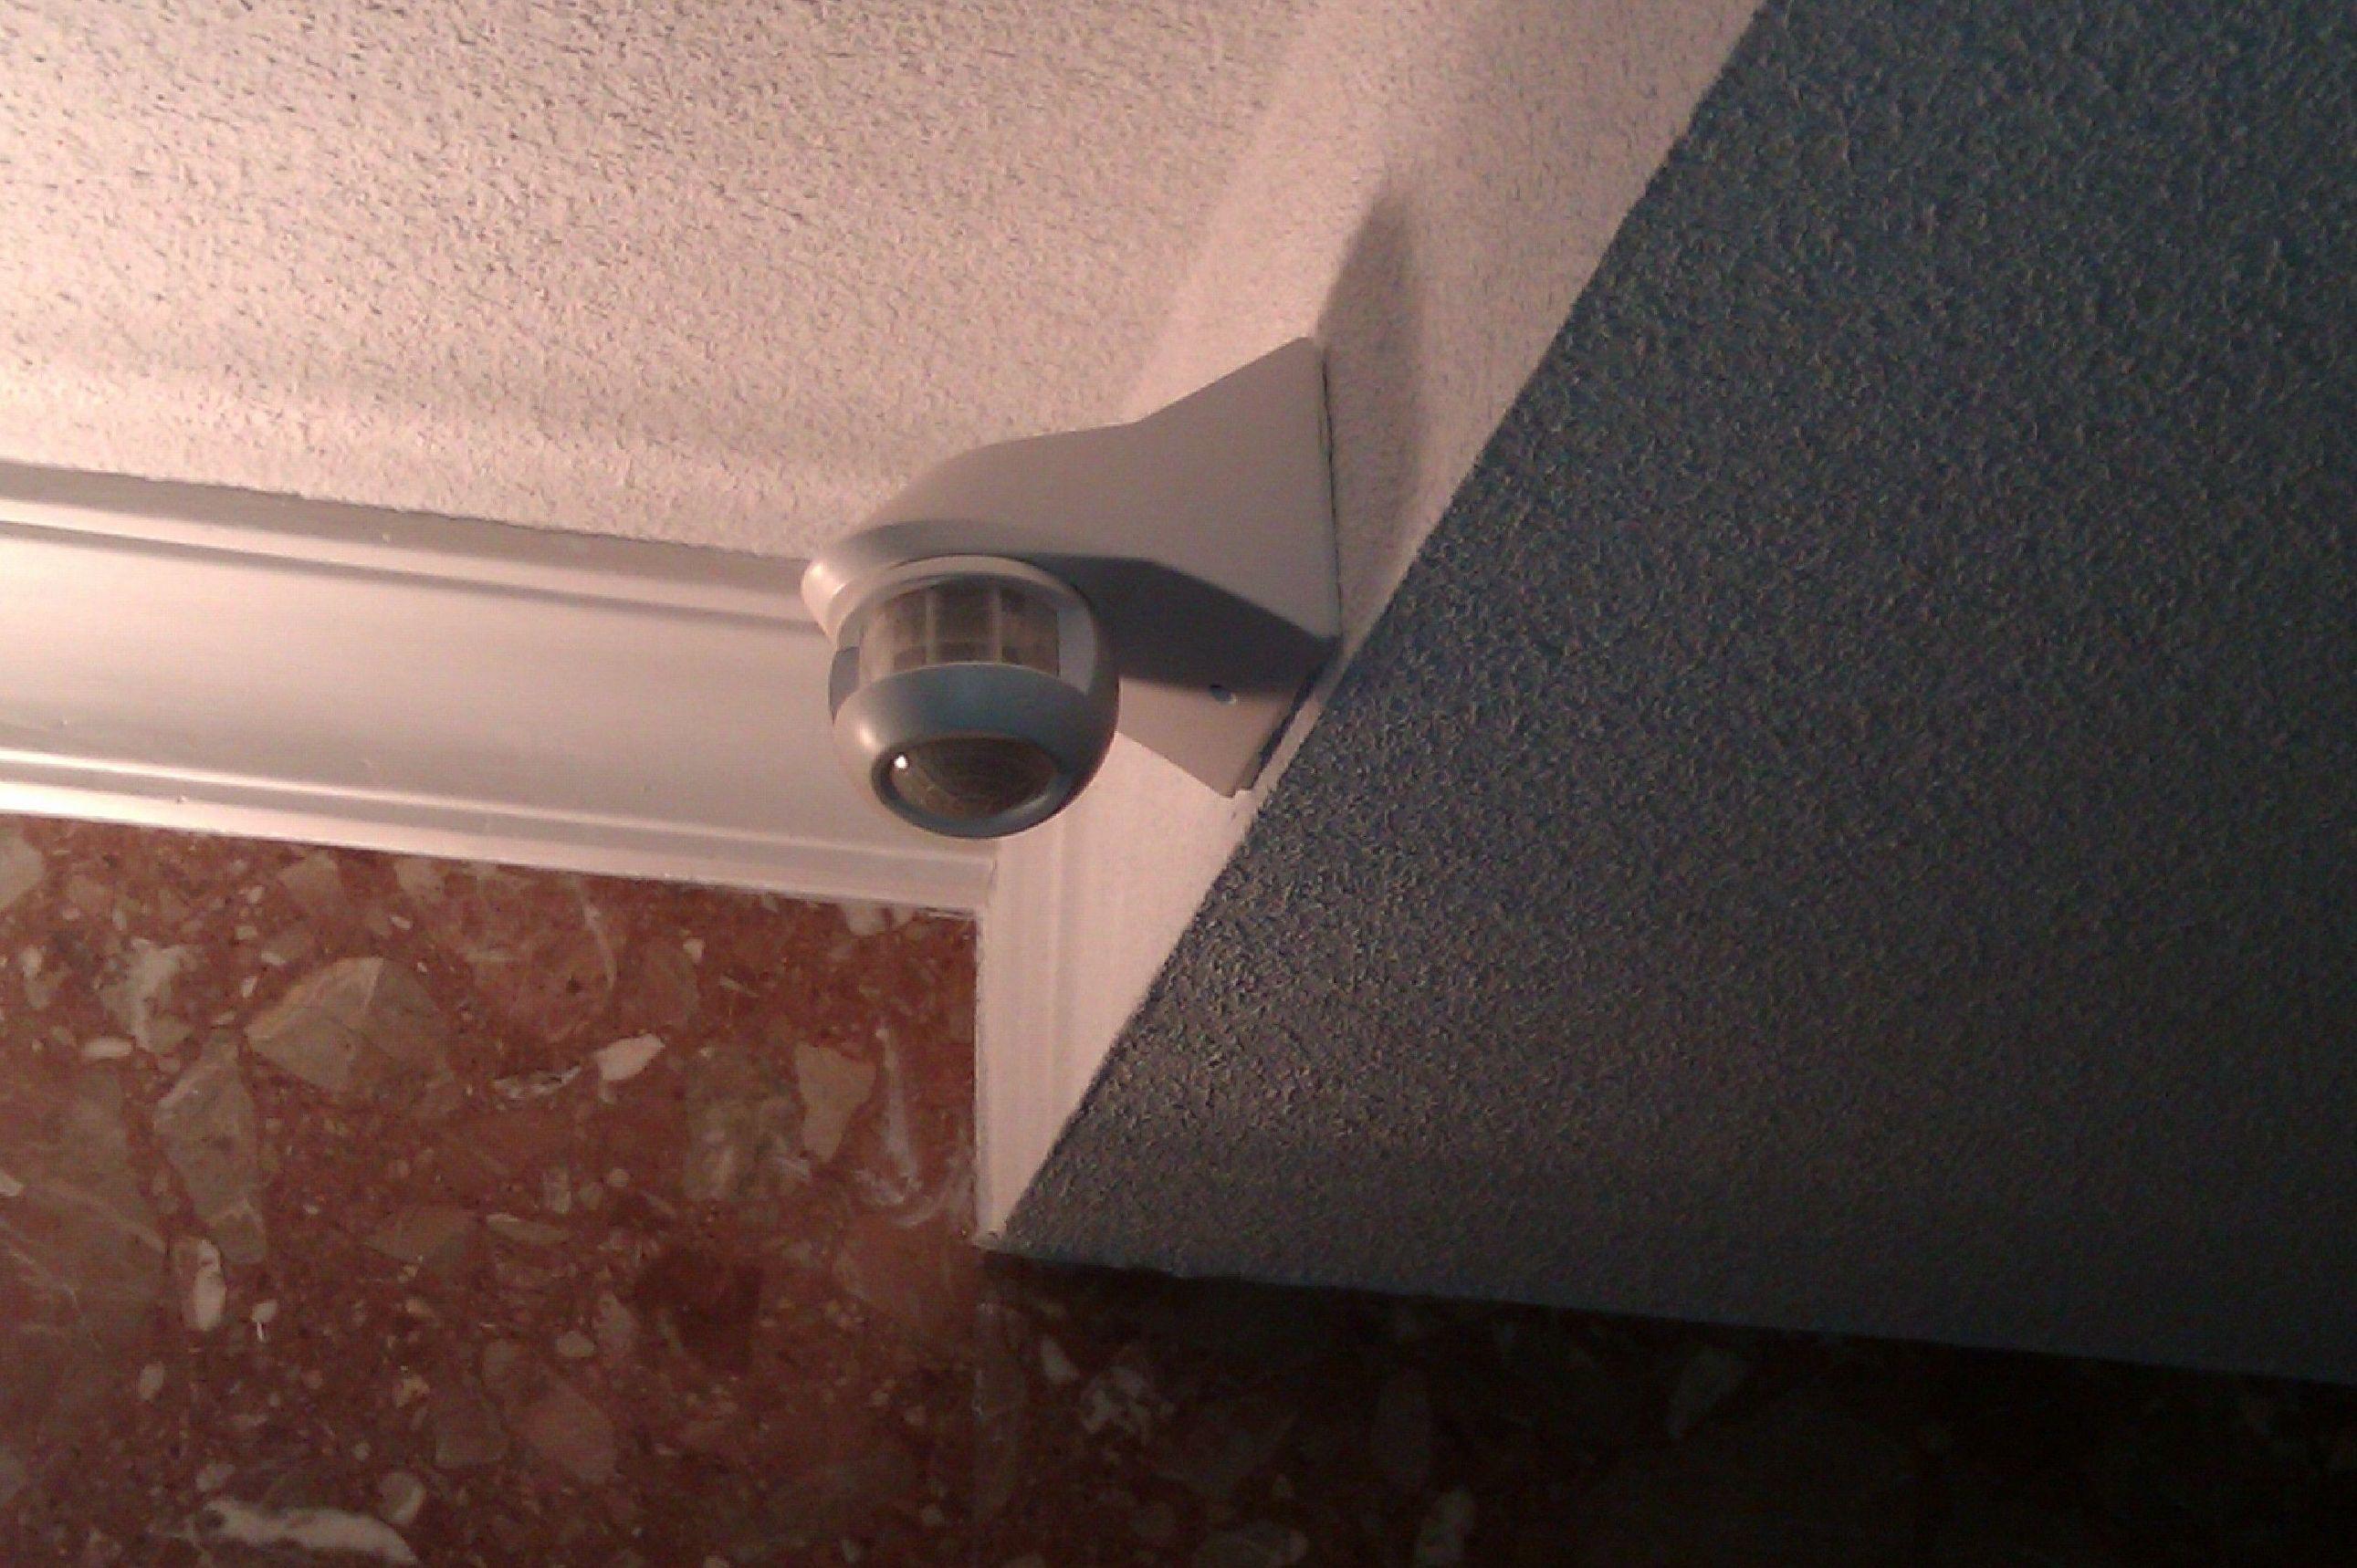 Foto 23 de Electricidad en Madrid | Jsp Electrotecnia, S.L.